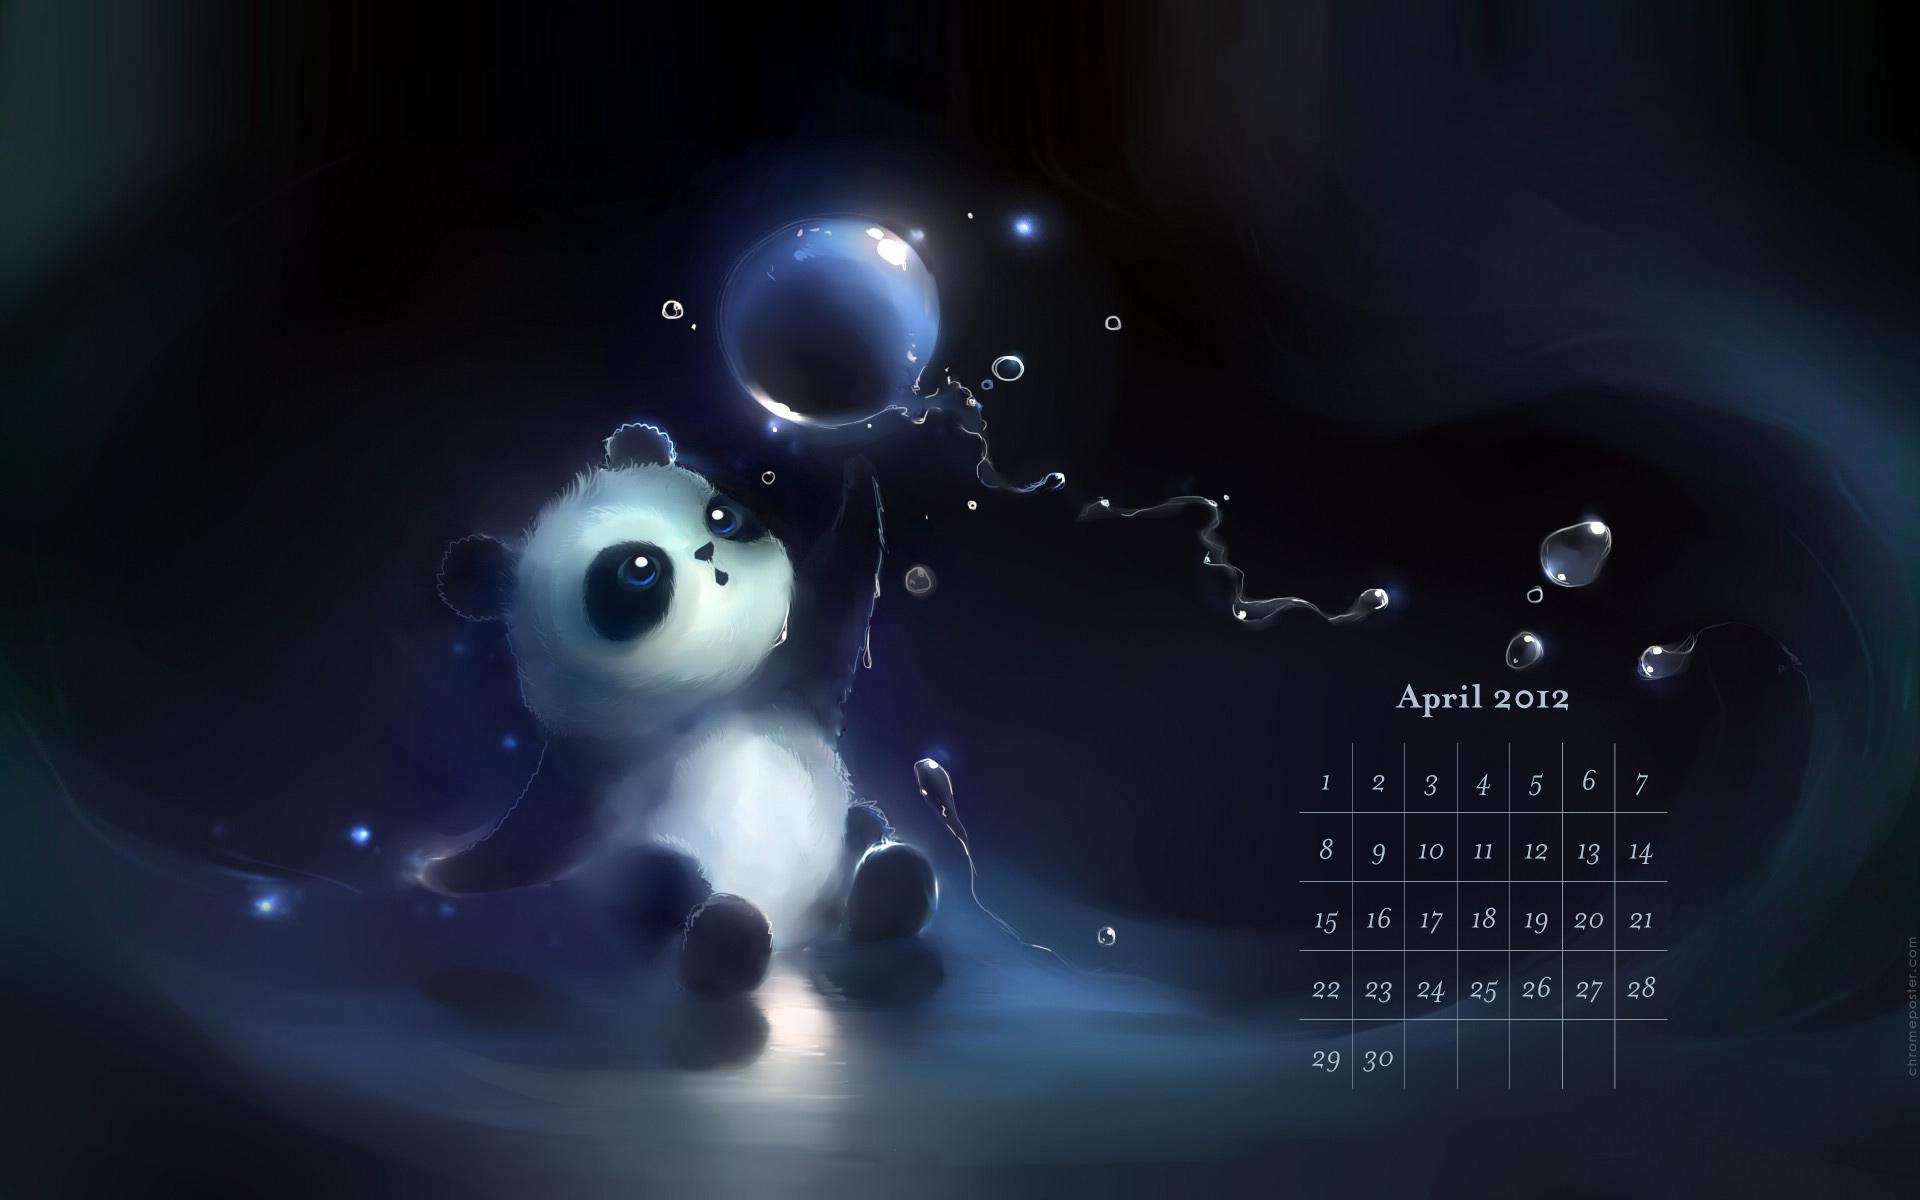 Desktop Calendar Wallpaper April 2012 Download   Webgranth 2015 1920x1200